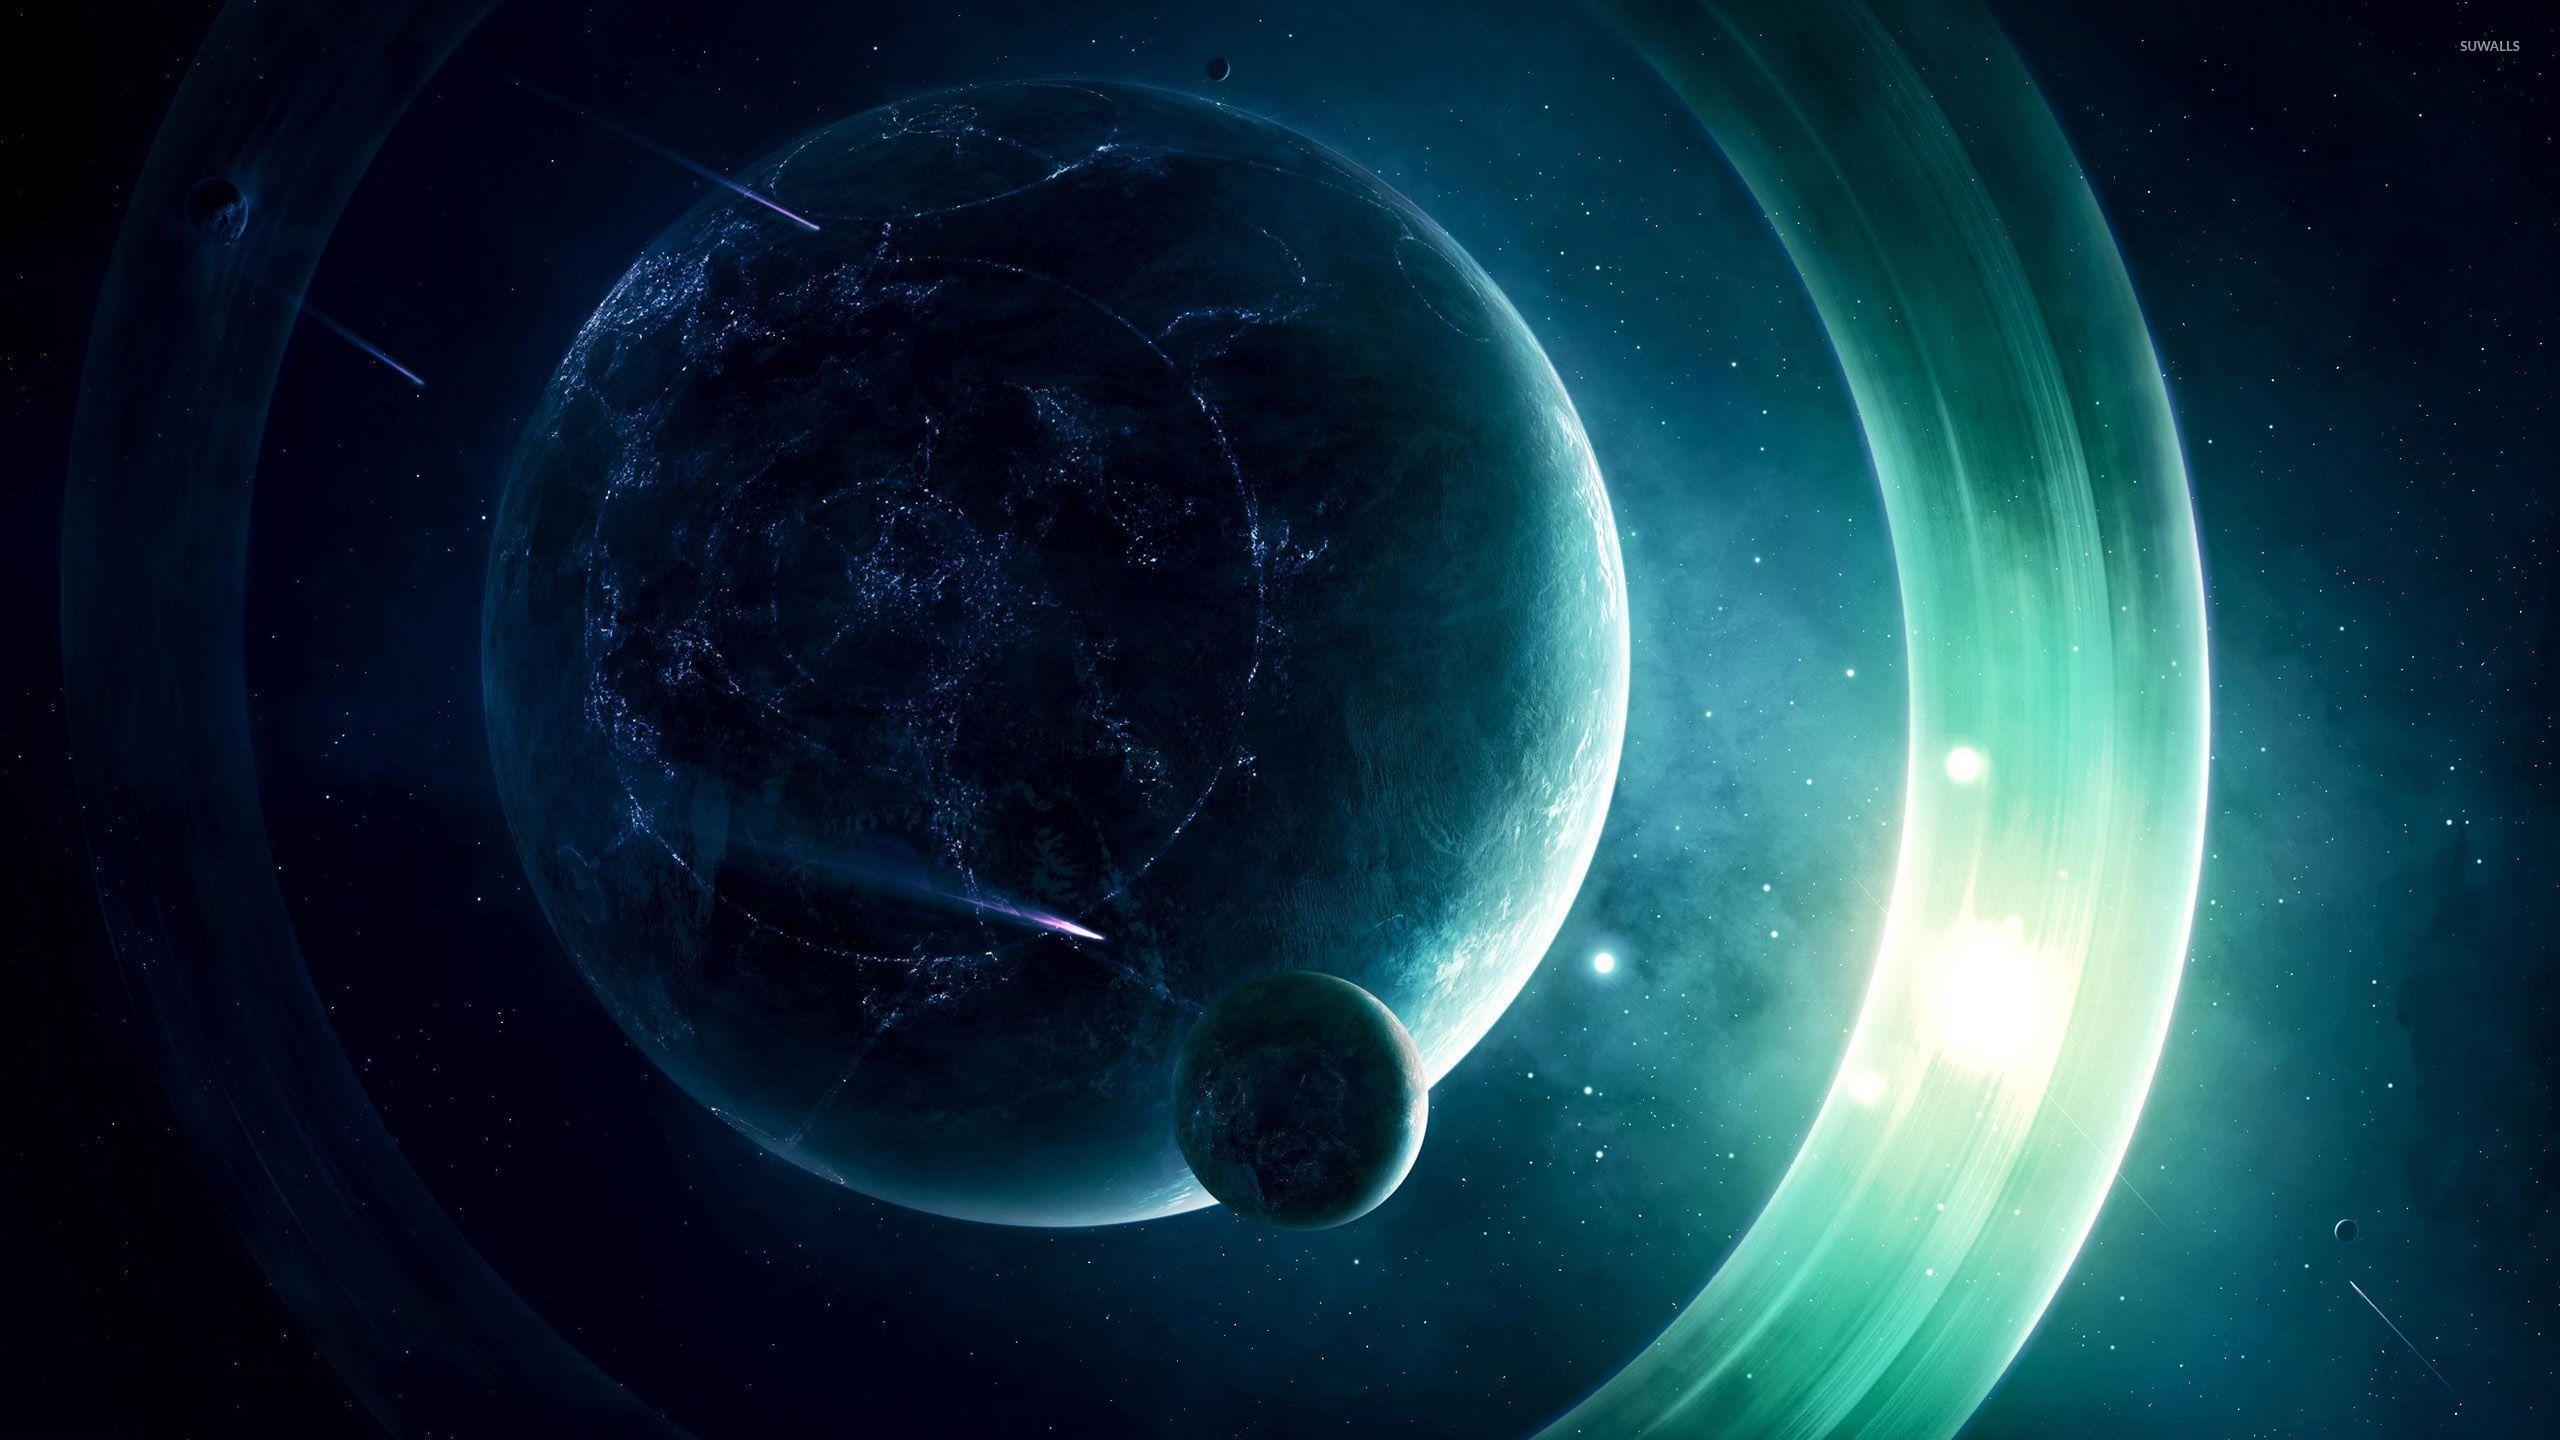 3d Galactic Wallpaper Planet Under Attack Wallpaper Fantasy Wallpapers 26753